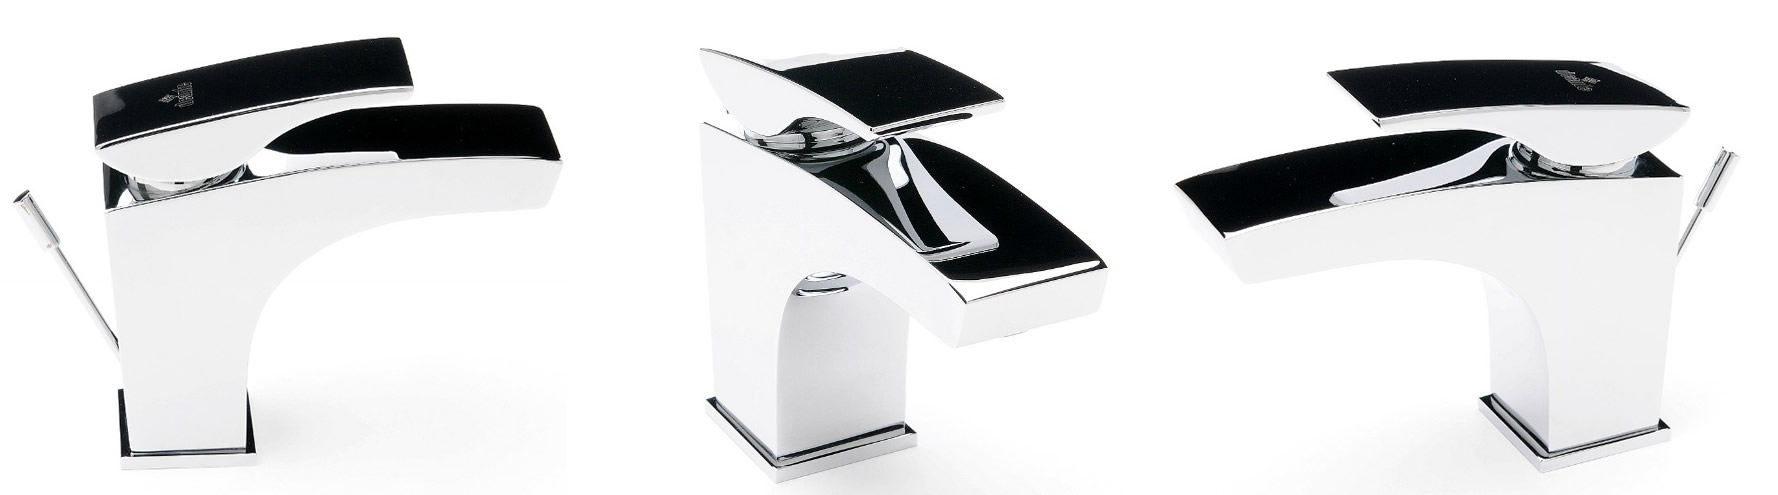 Bateria umywalkowa Deante Minimal widoki